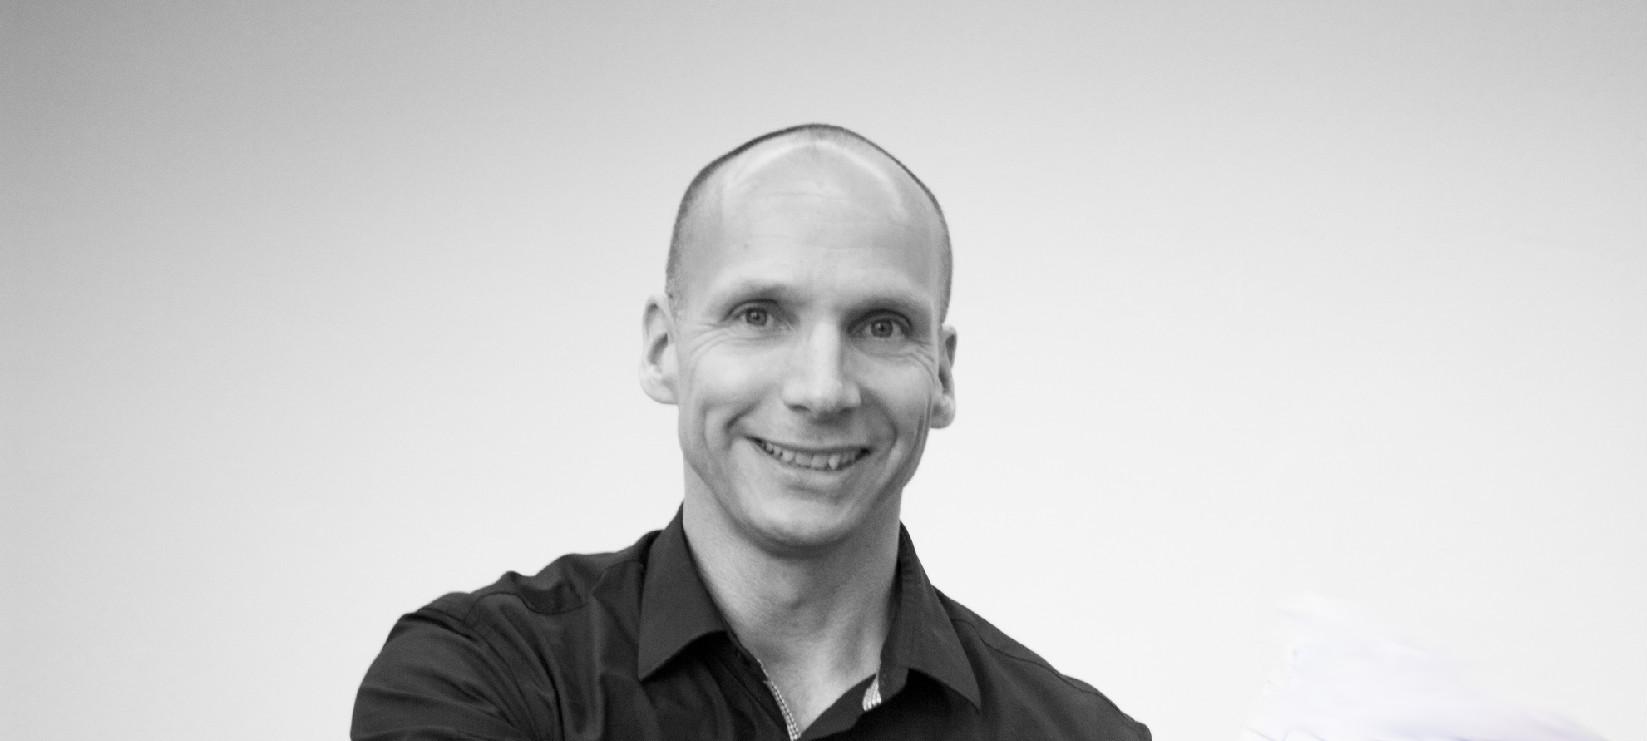 Markus Büchtmann